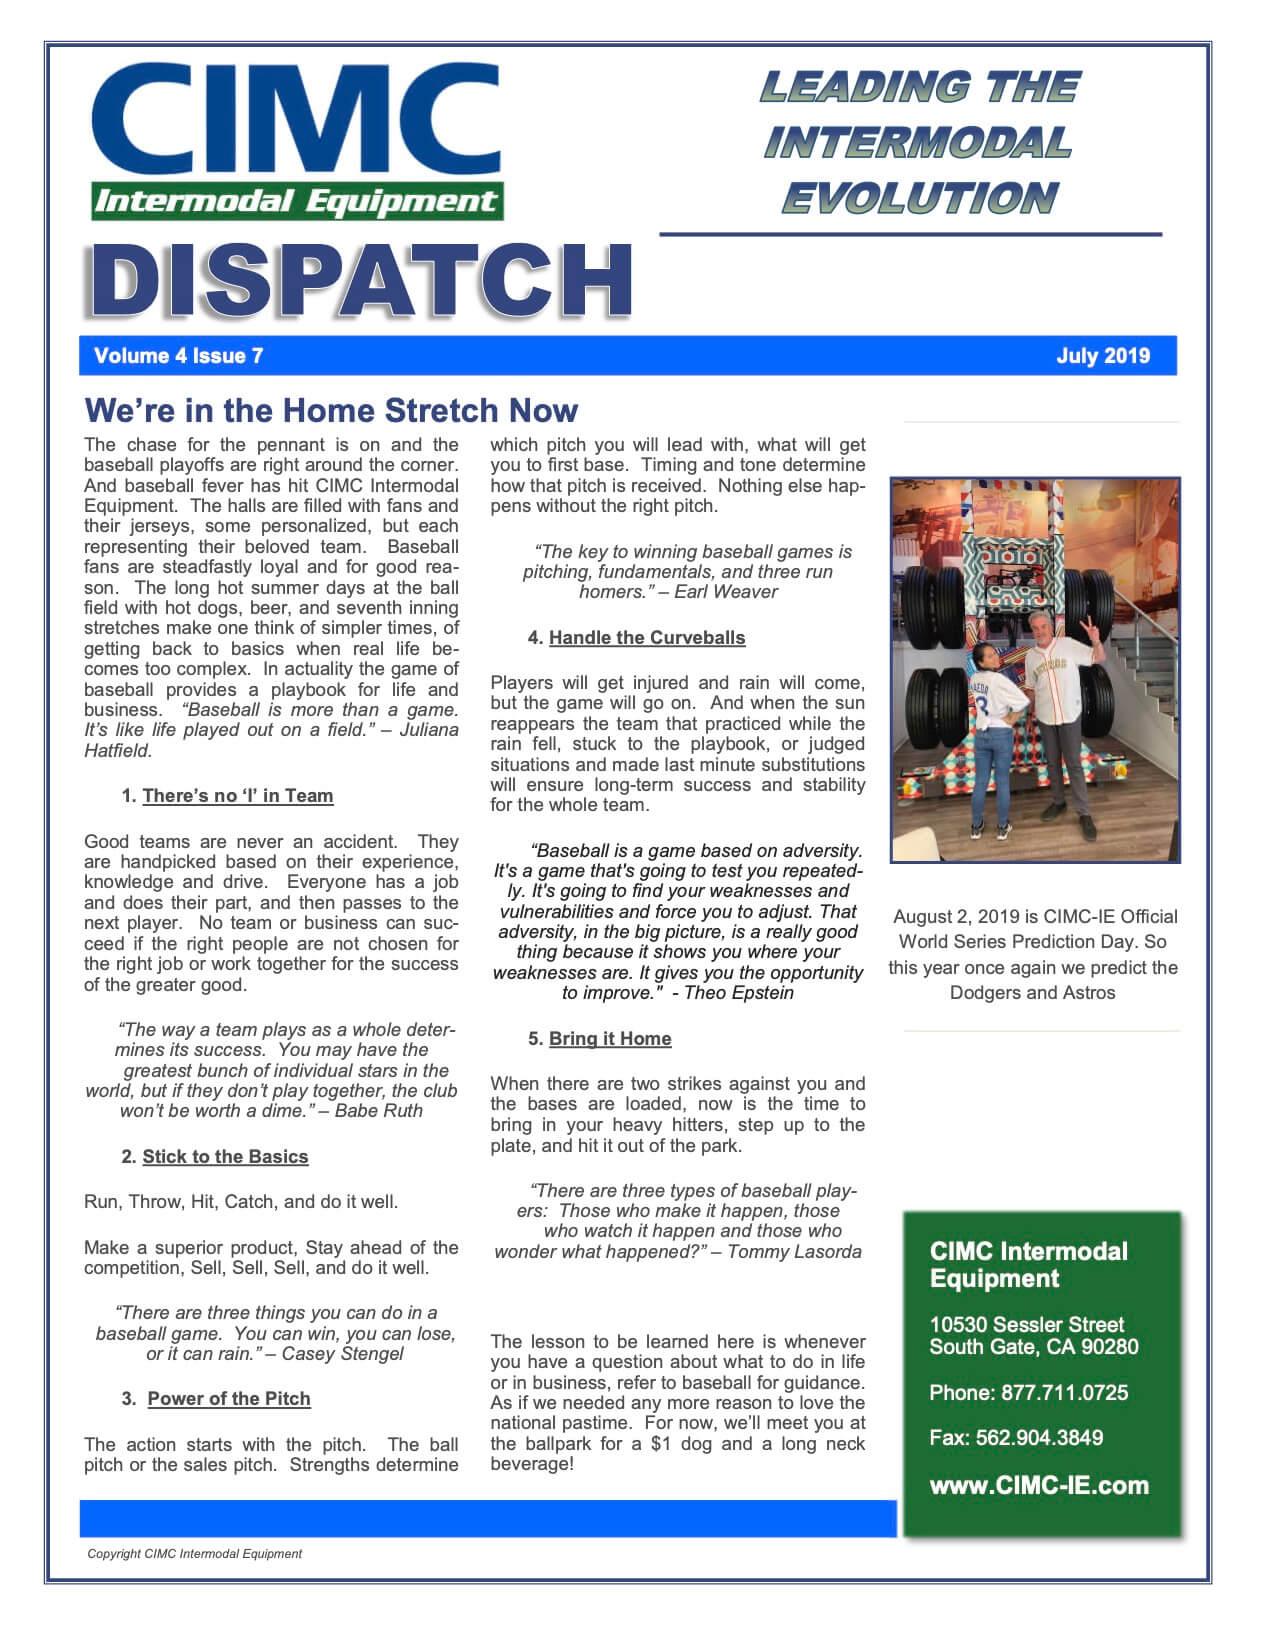 CIMC Dispatch July 2019